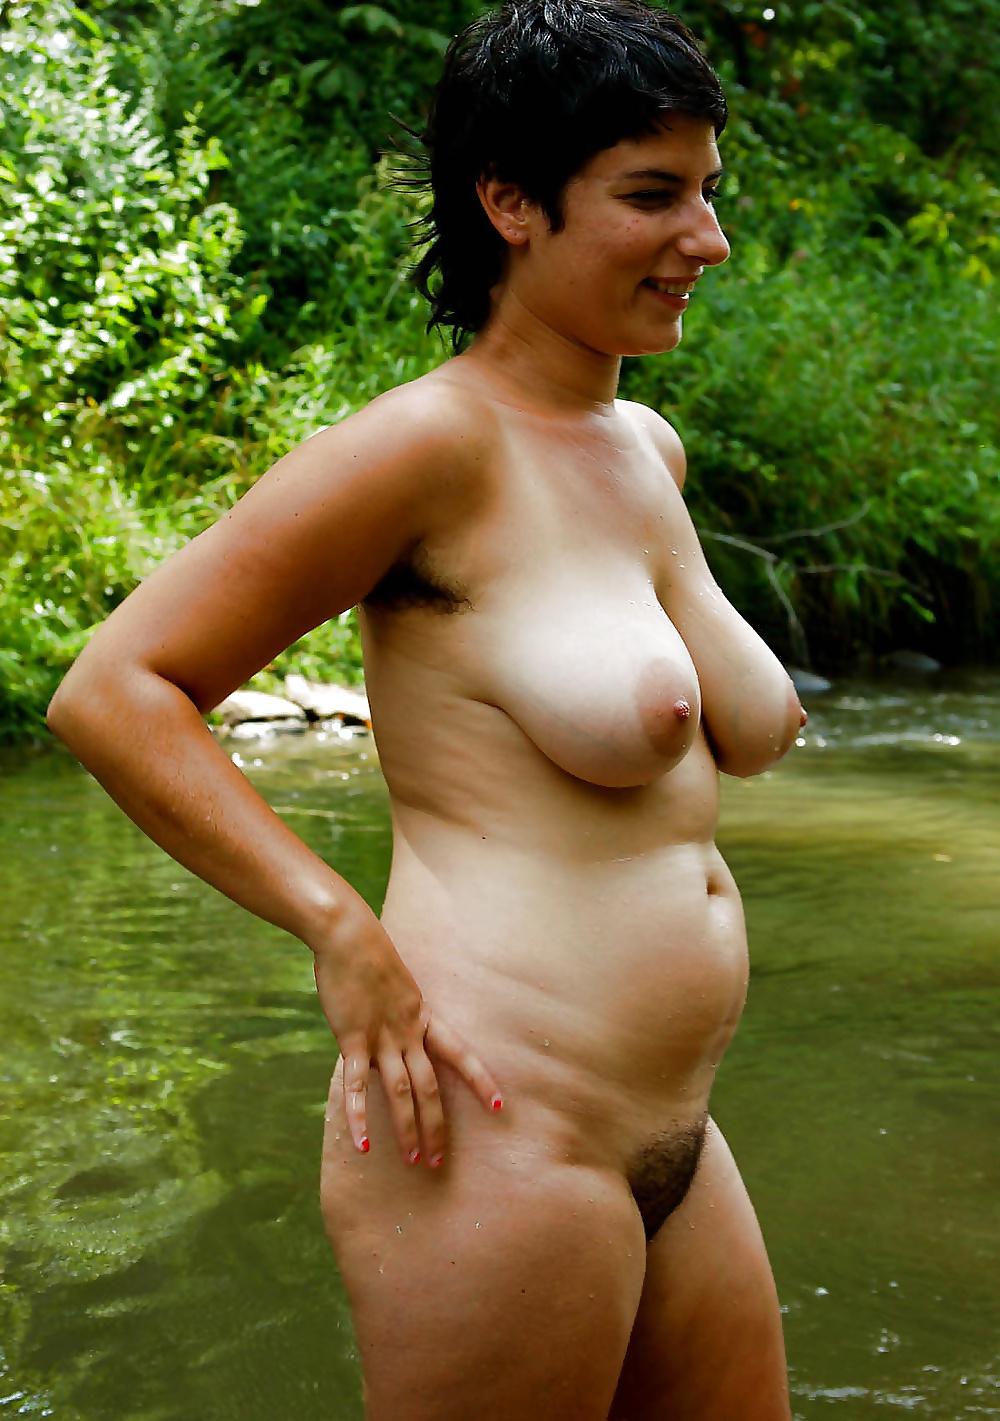 Mollige natürliche Babys in Nackbildern gratis